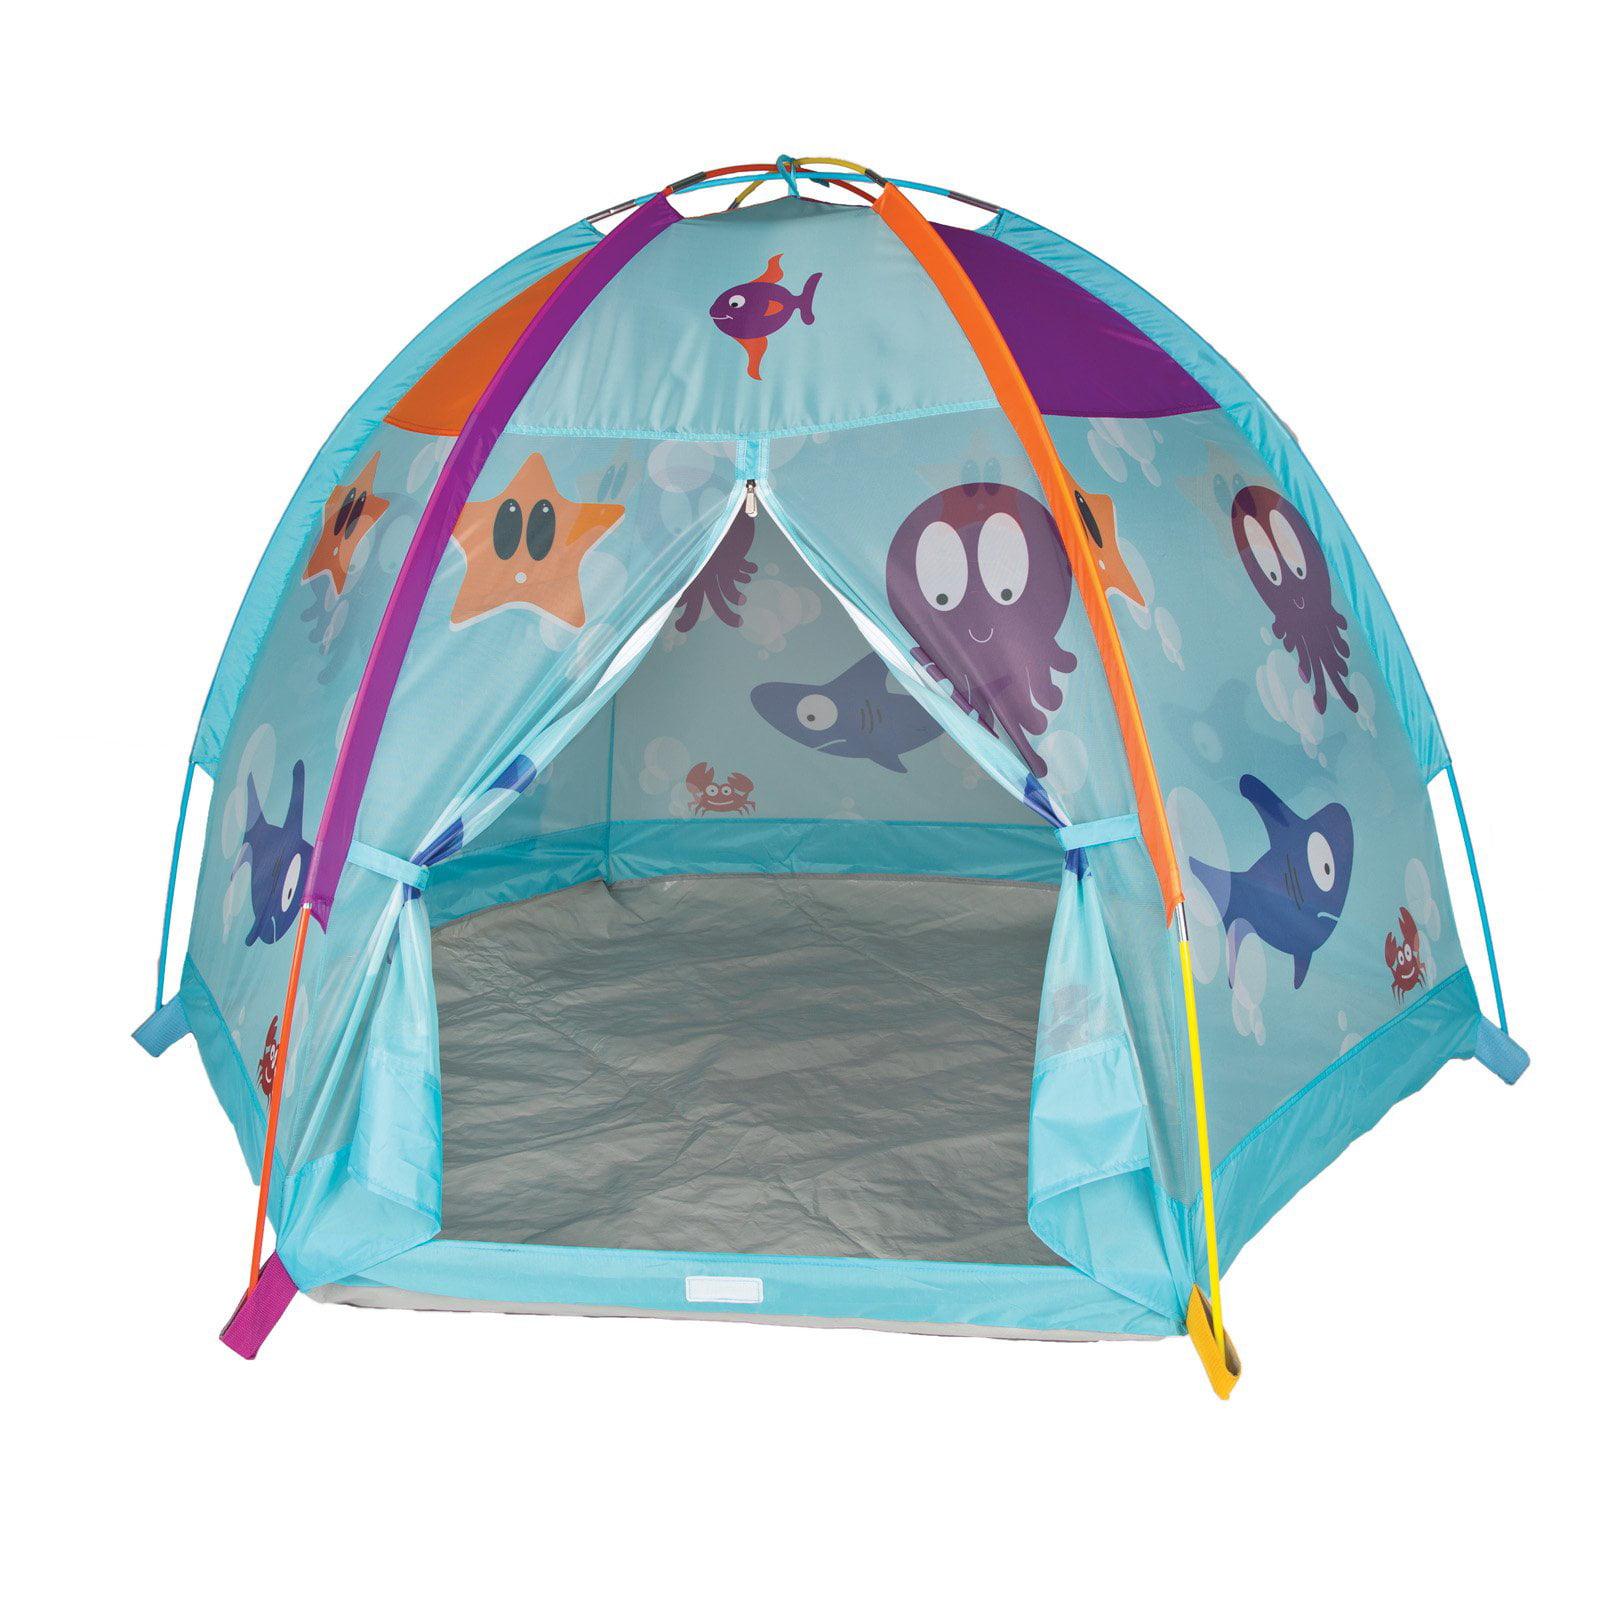 Ocean Adventures Dome Tent, Blue